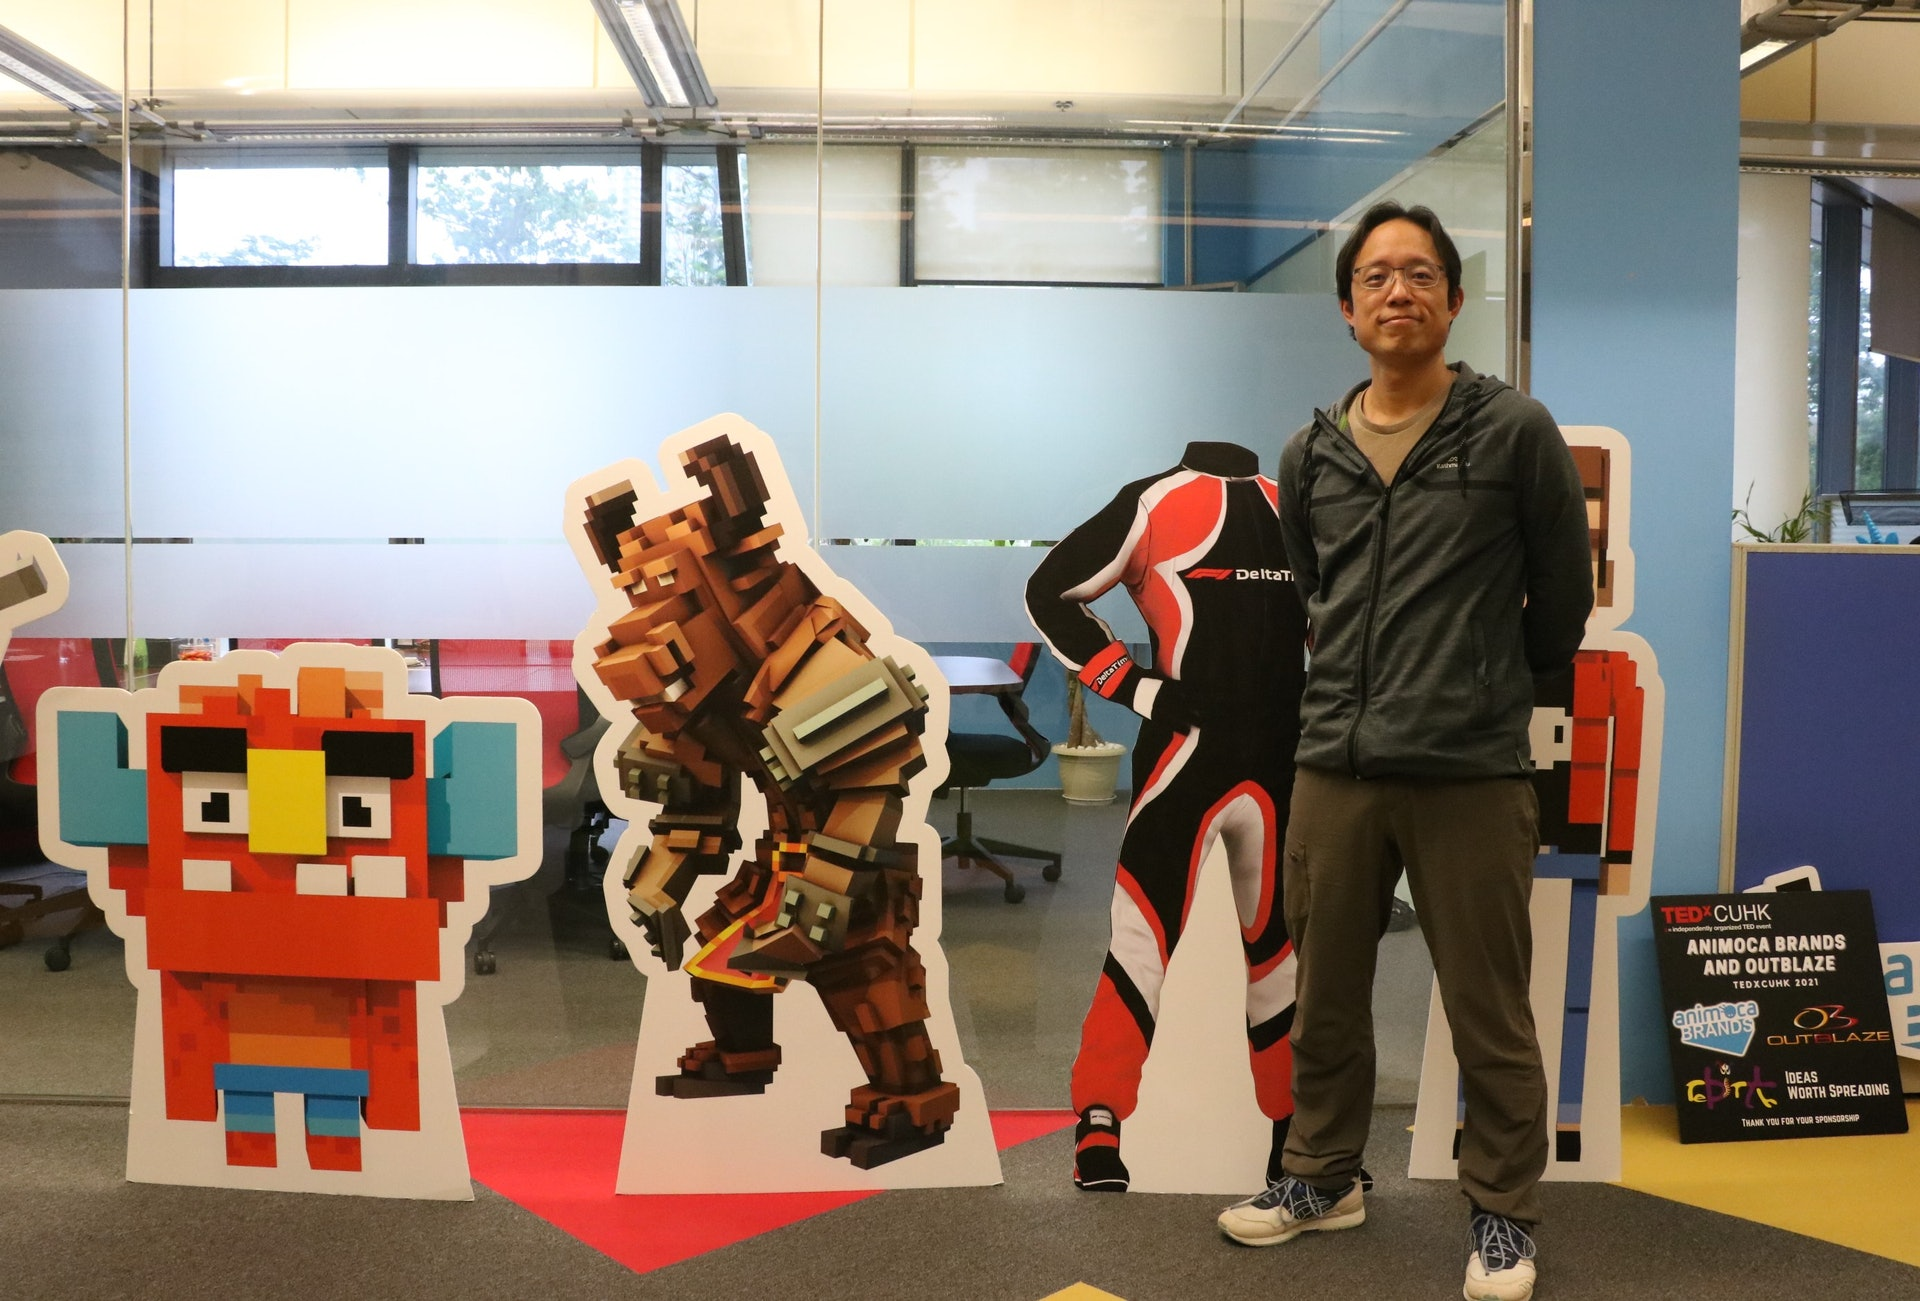 Animoca Brands創辦人蕭逸(Yat Siu)預期,區塊鏈遊戲未來將成為電子遊戲其中一個主流,傳統遊戲商屆時將會因為市場需求而被迫跟隨。(伍振中攝)